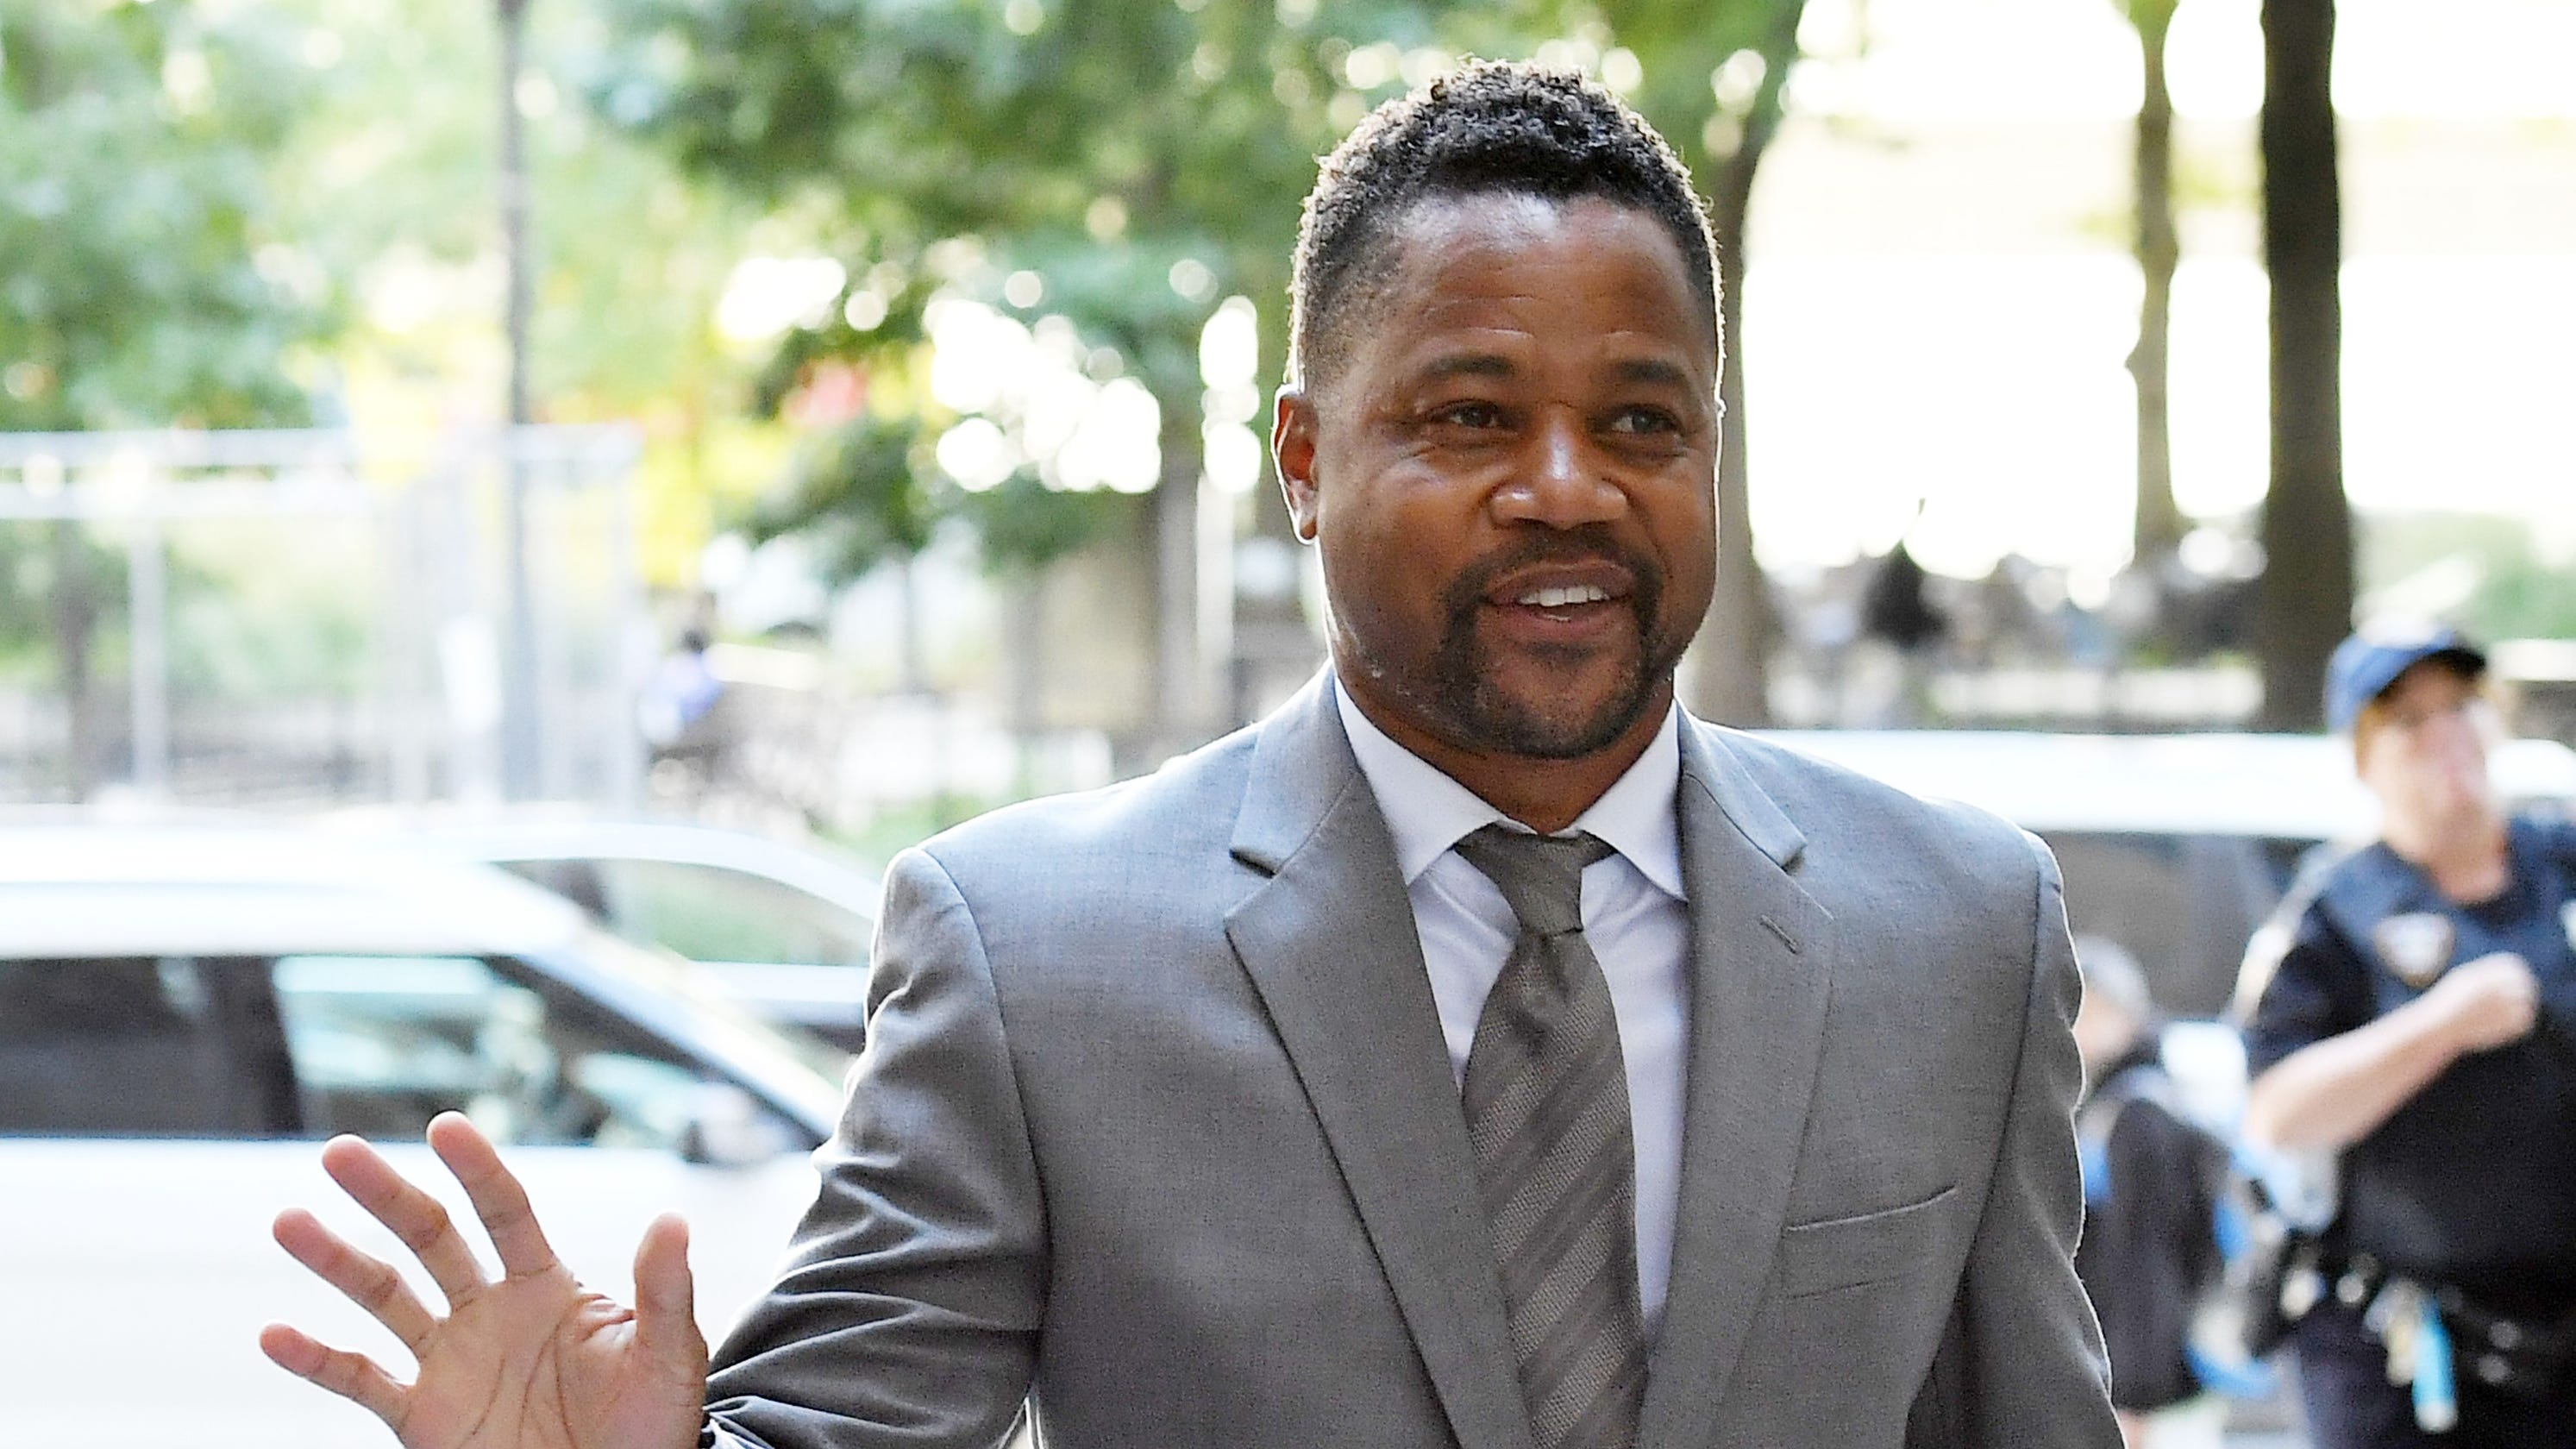 Cuba Gooding Jr. groping trial in NYC postponed until October